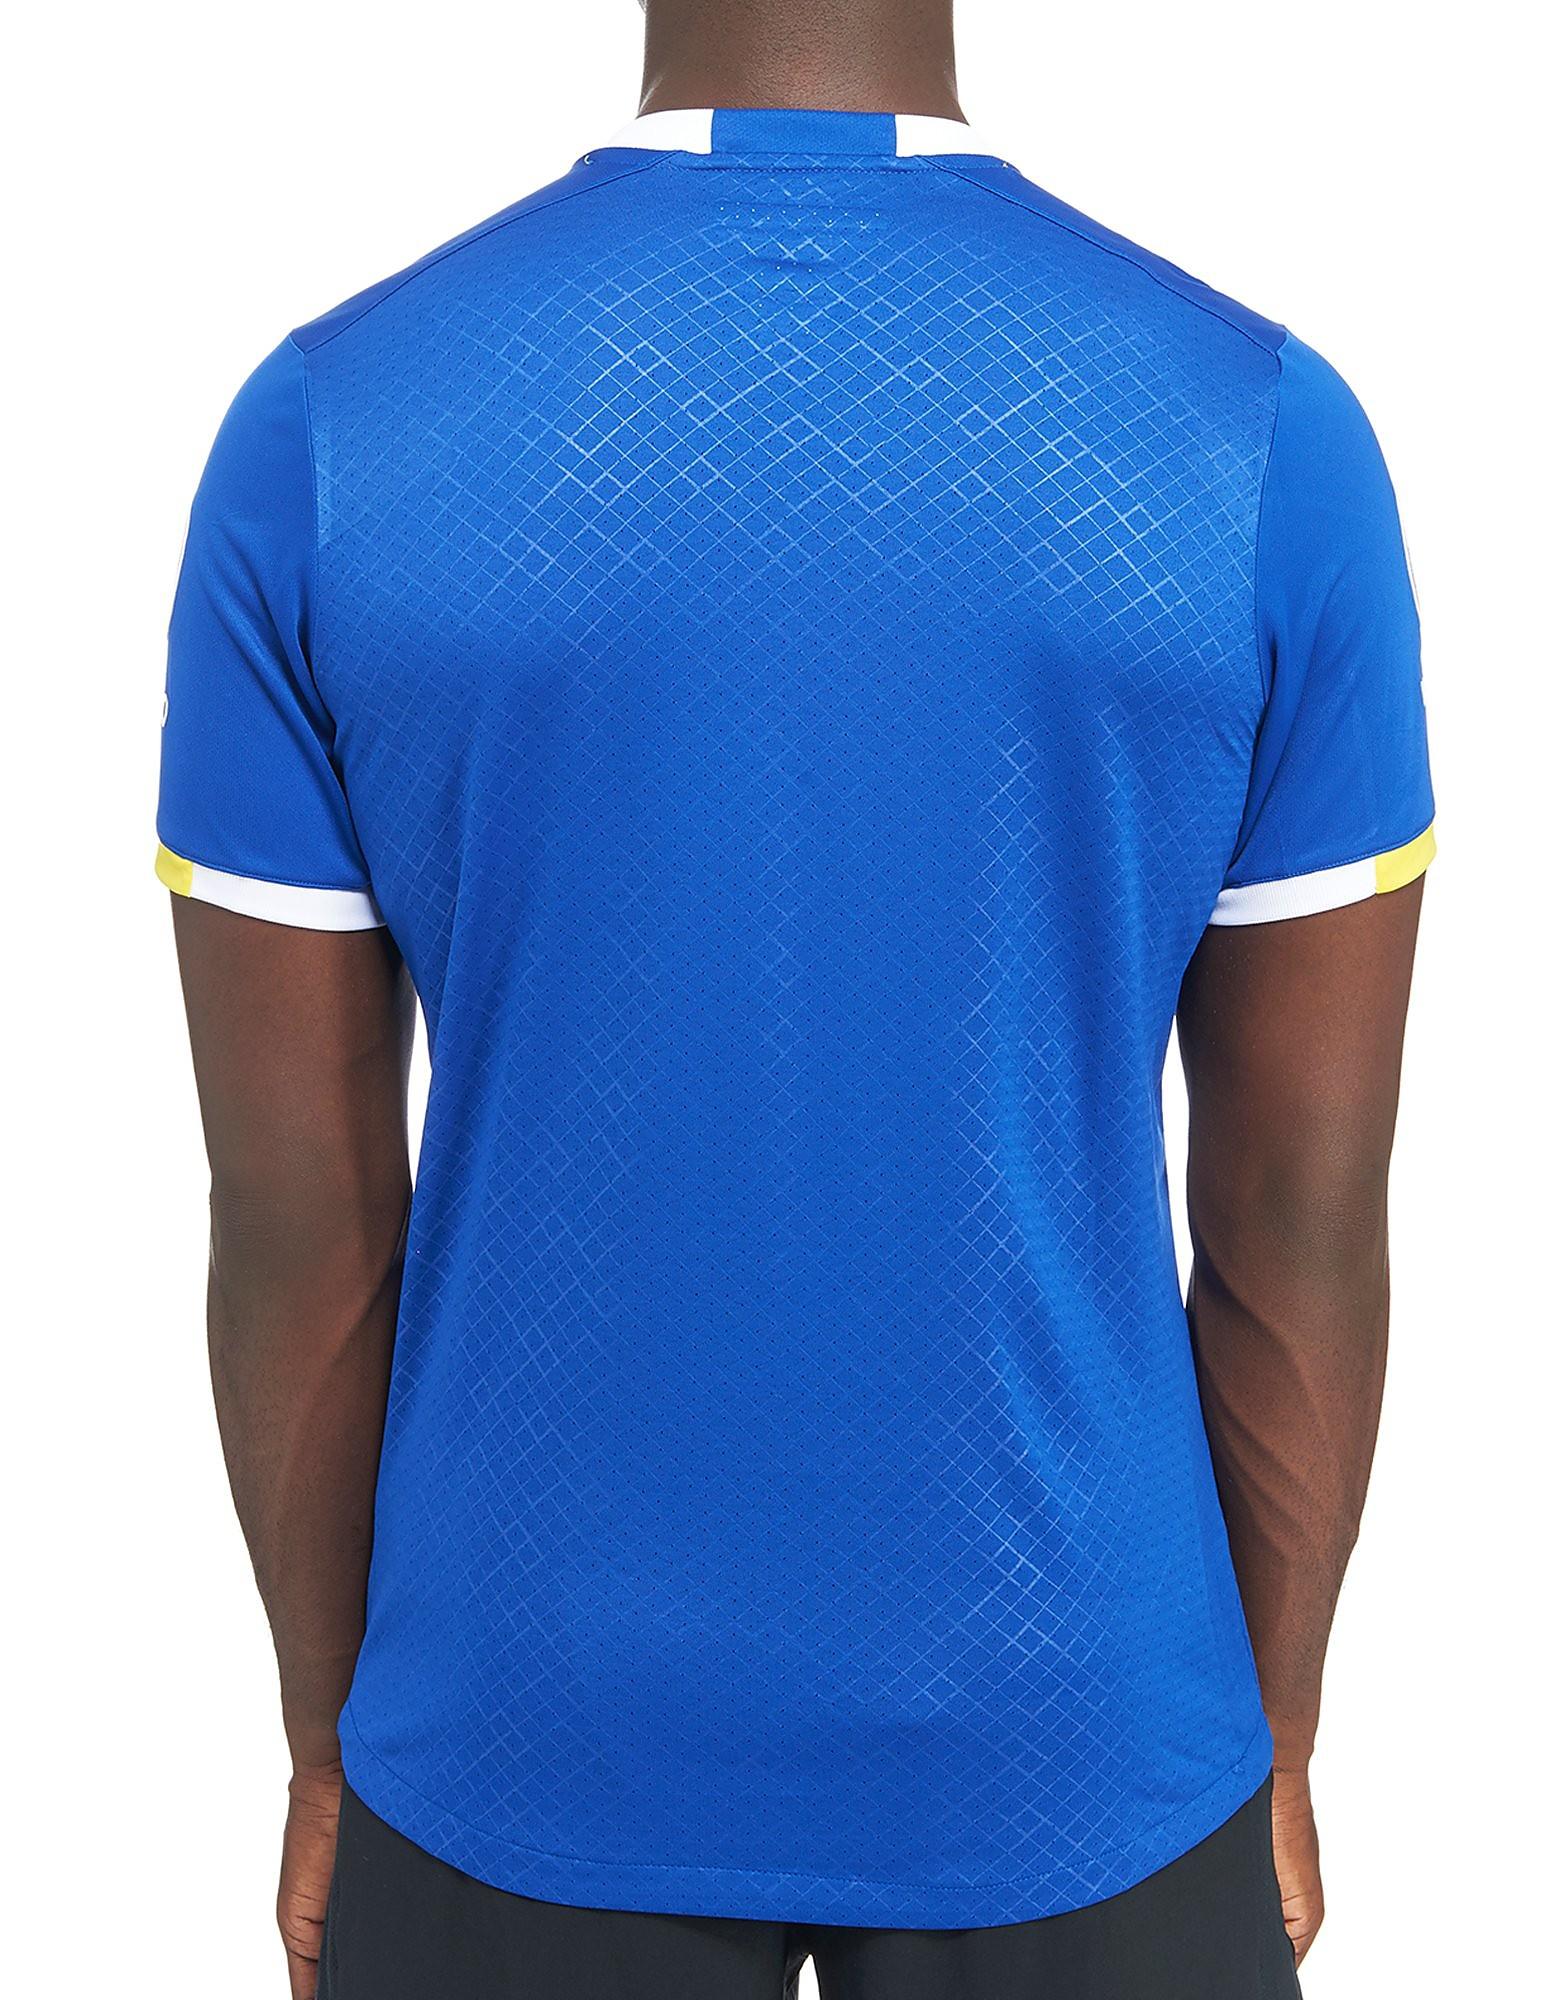 Umbro Everton FC 2016/17 Home Prem Badge Shirt